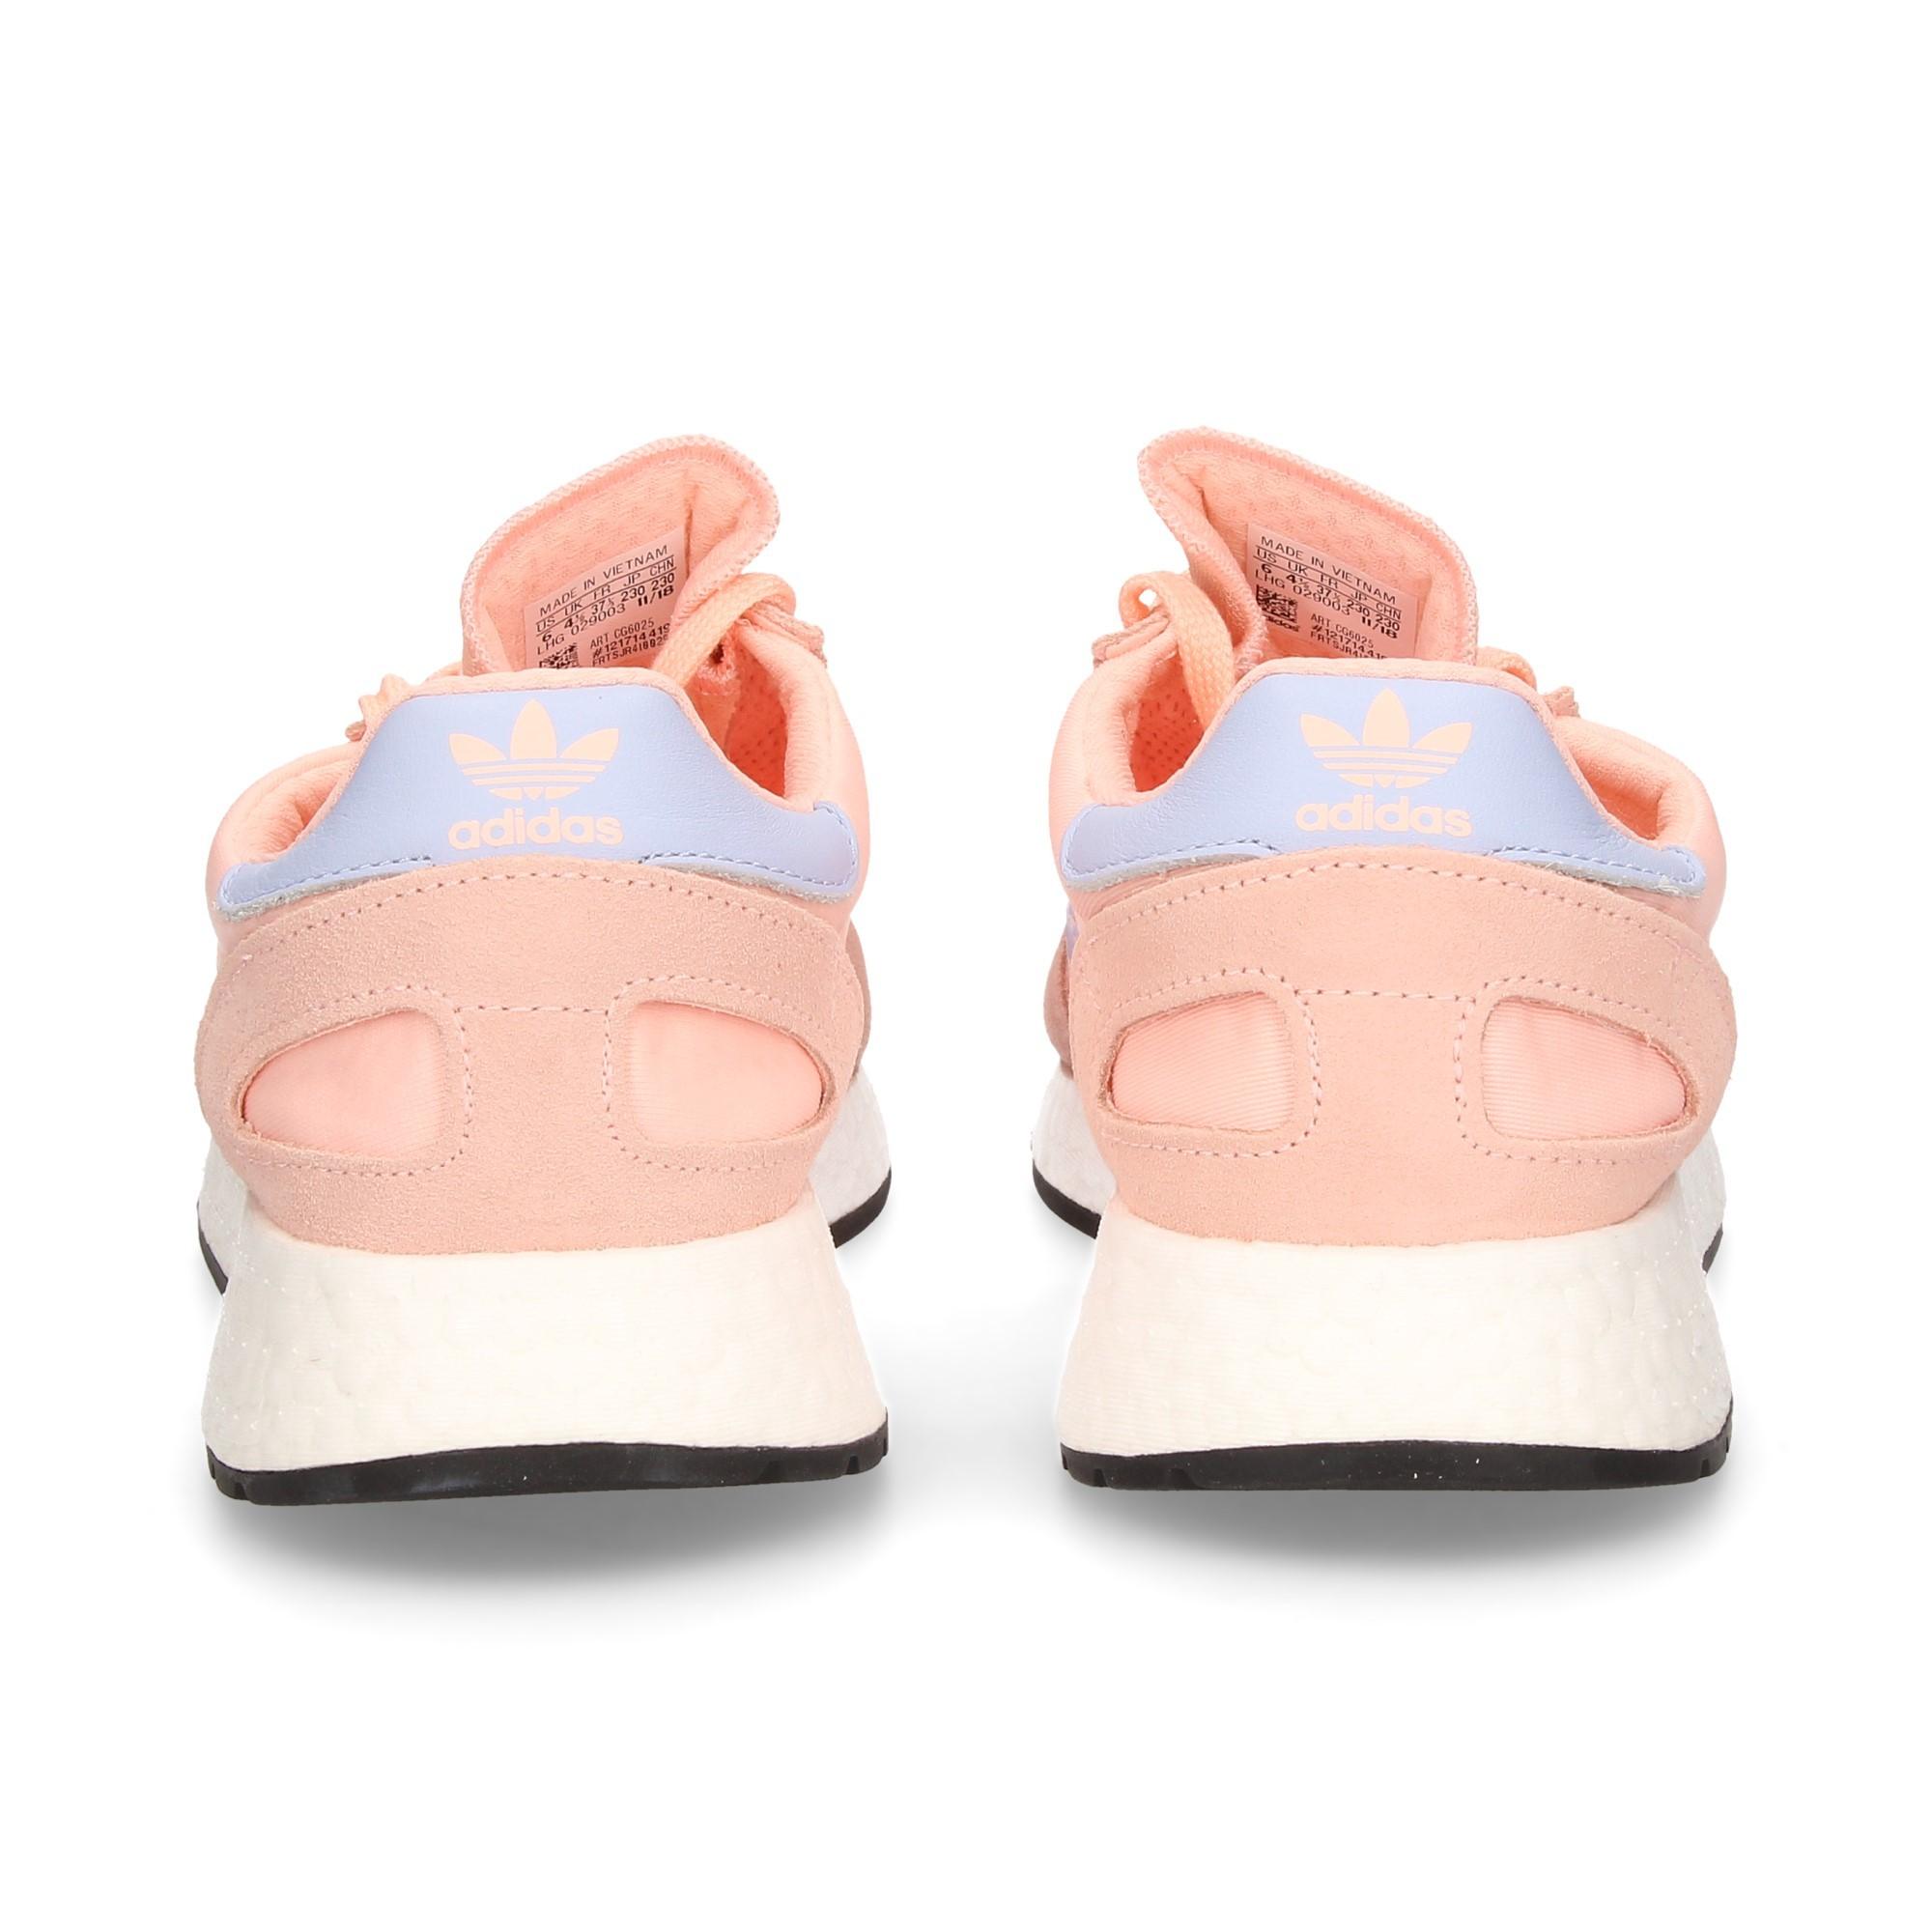 slipper-3-bands-multi-orange